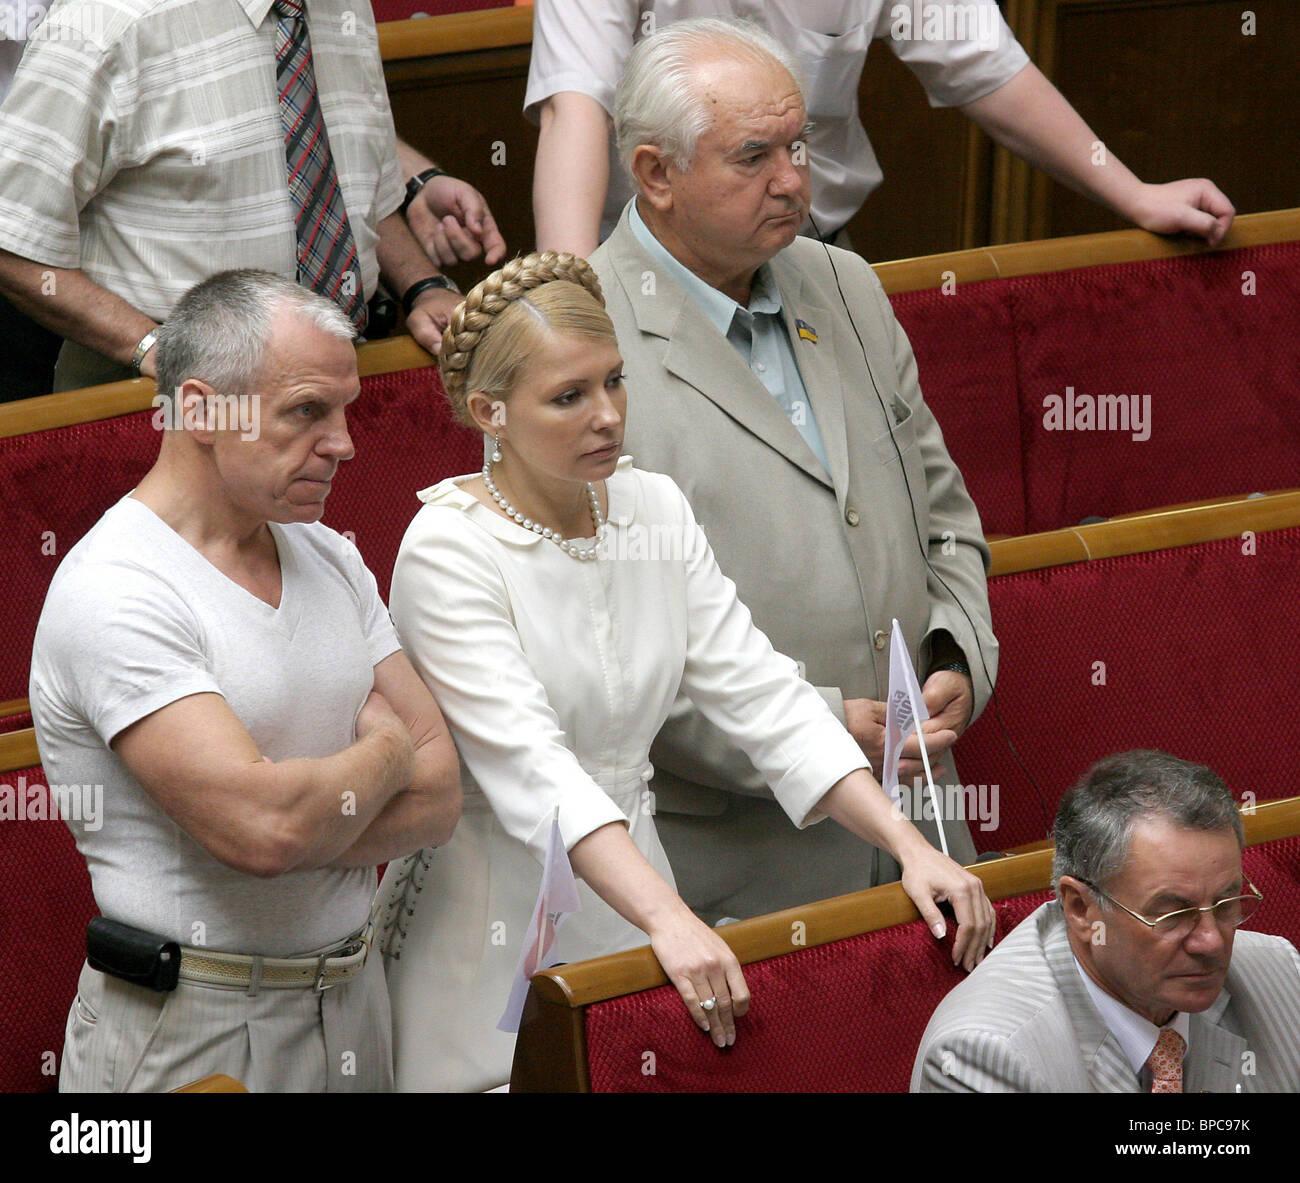 Deputies of Yulia Tymoshenko Bloc (BYT) speak through megaphones attempting to interrupt session of Ukrainian Parliament - Stock Image